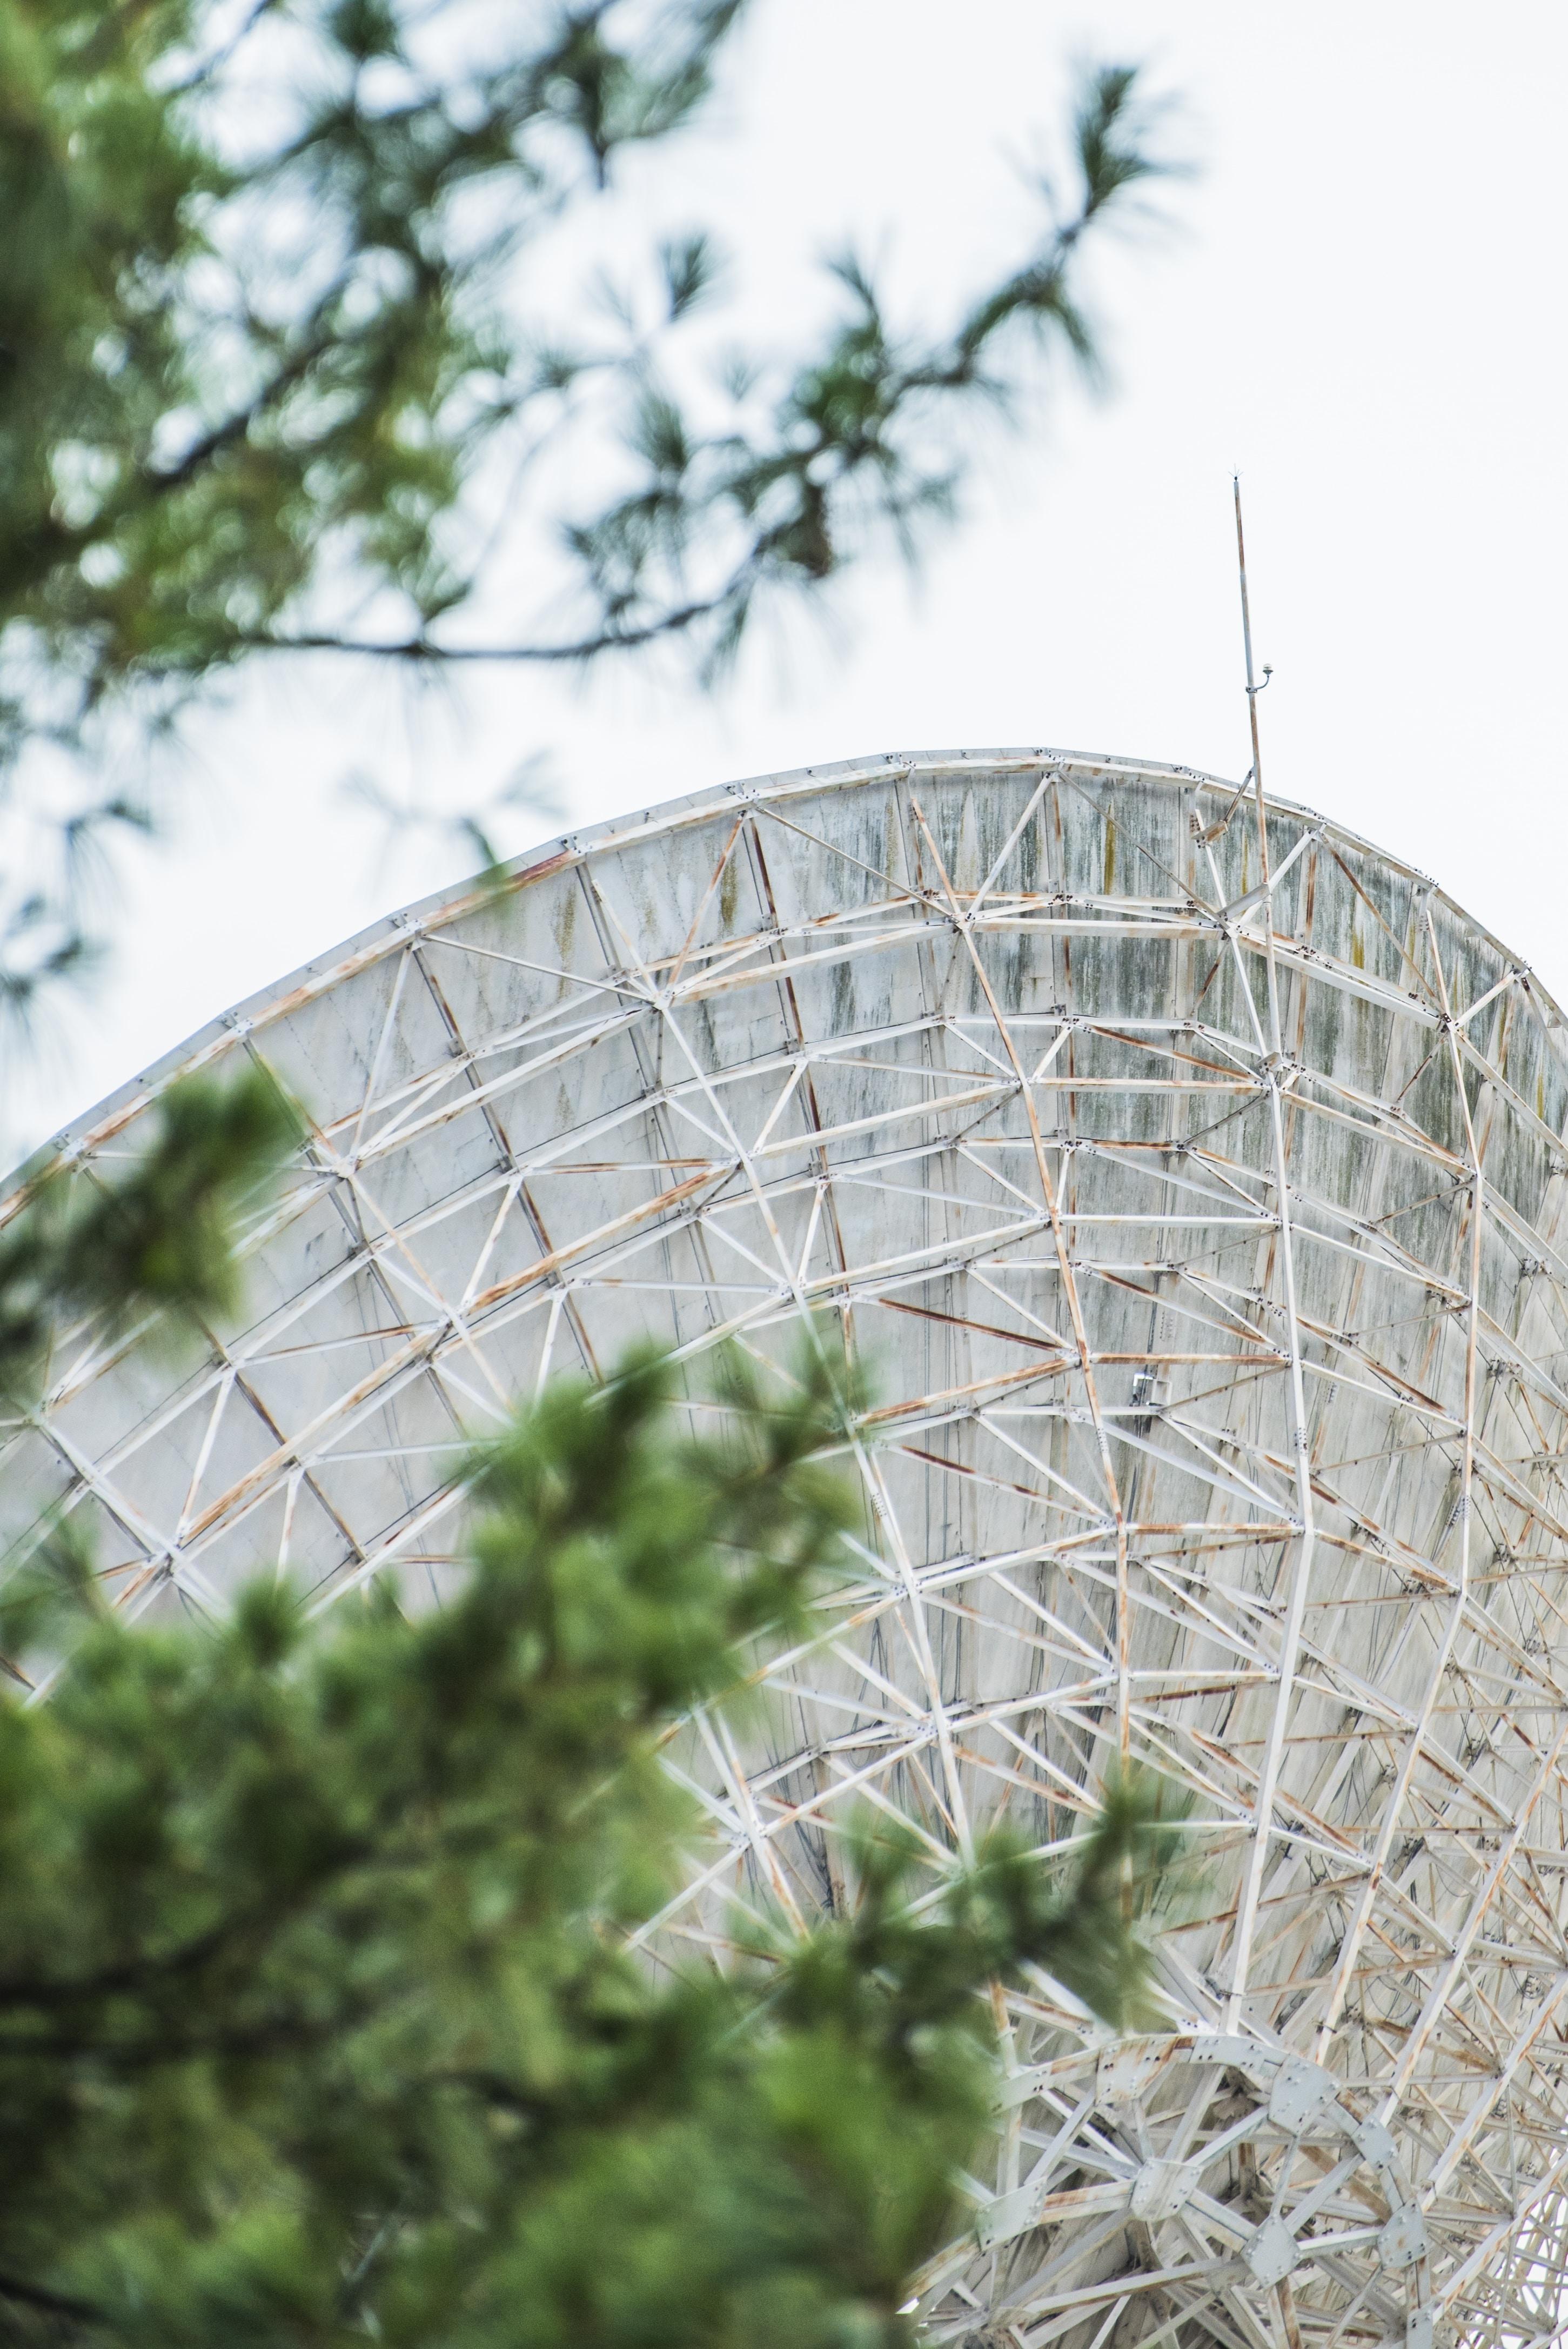 round gray metal industrial machine near trees